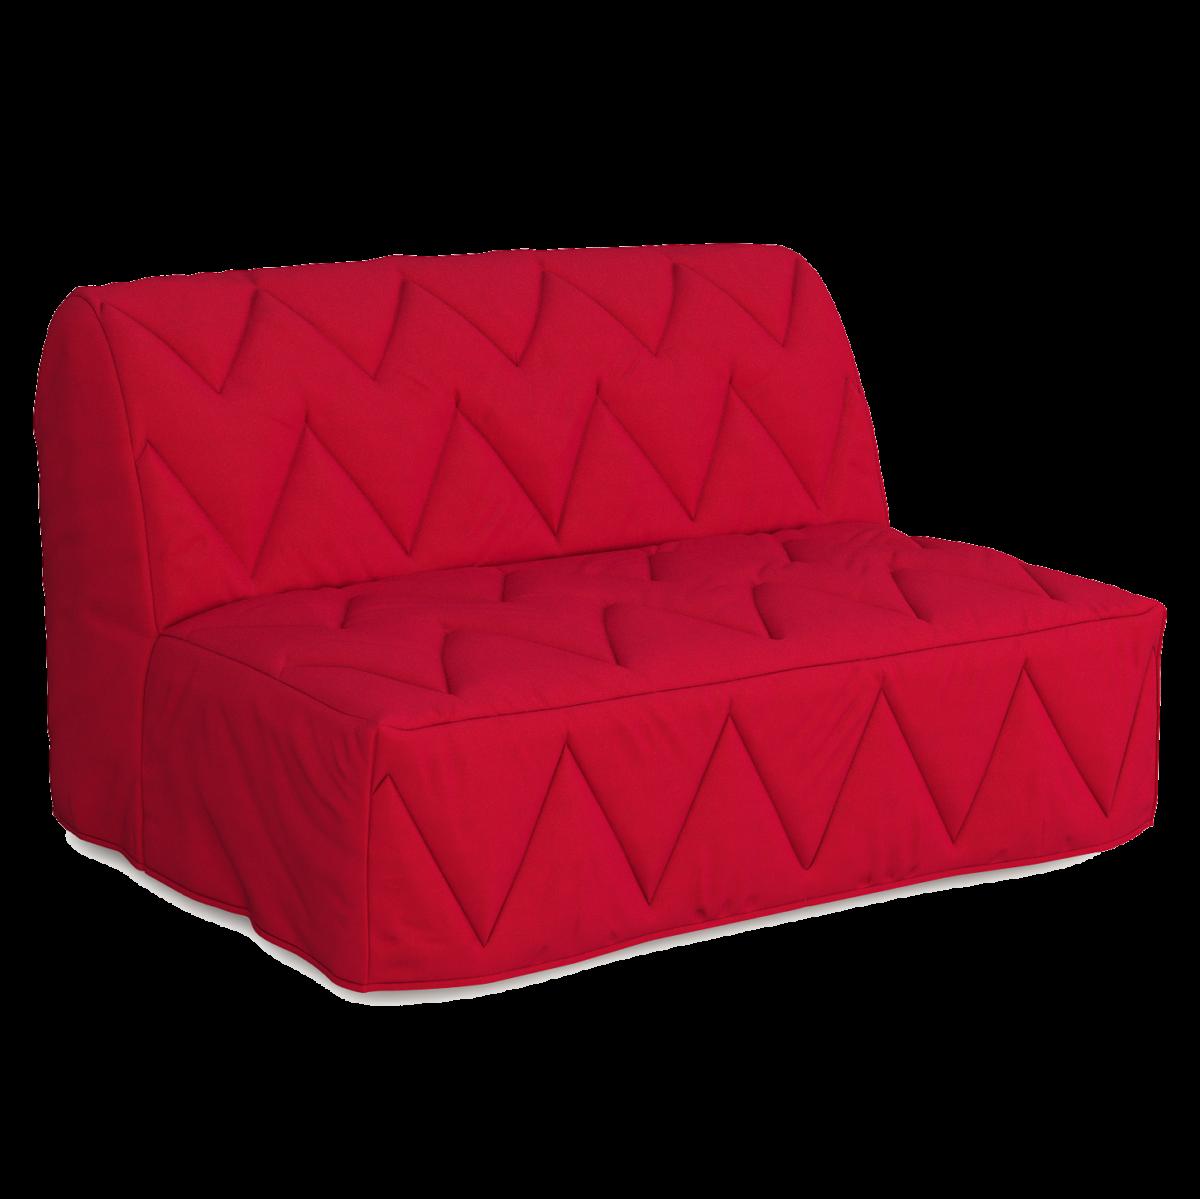 Диван-кровать Вилли (энигма 28)